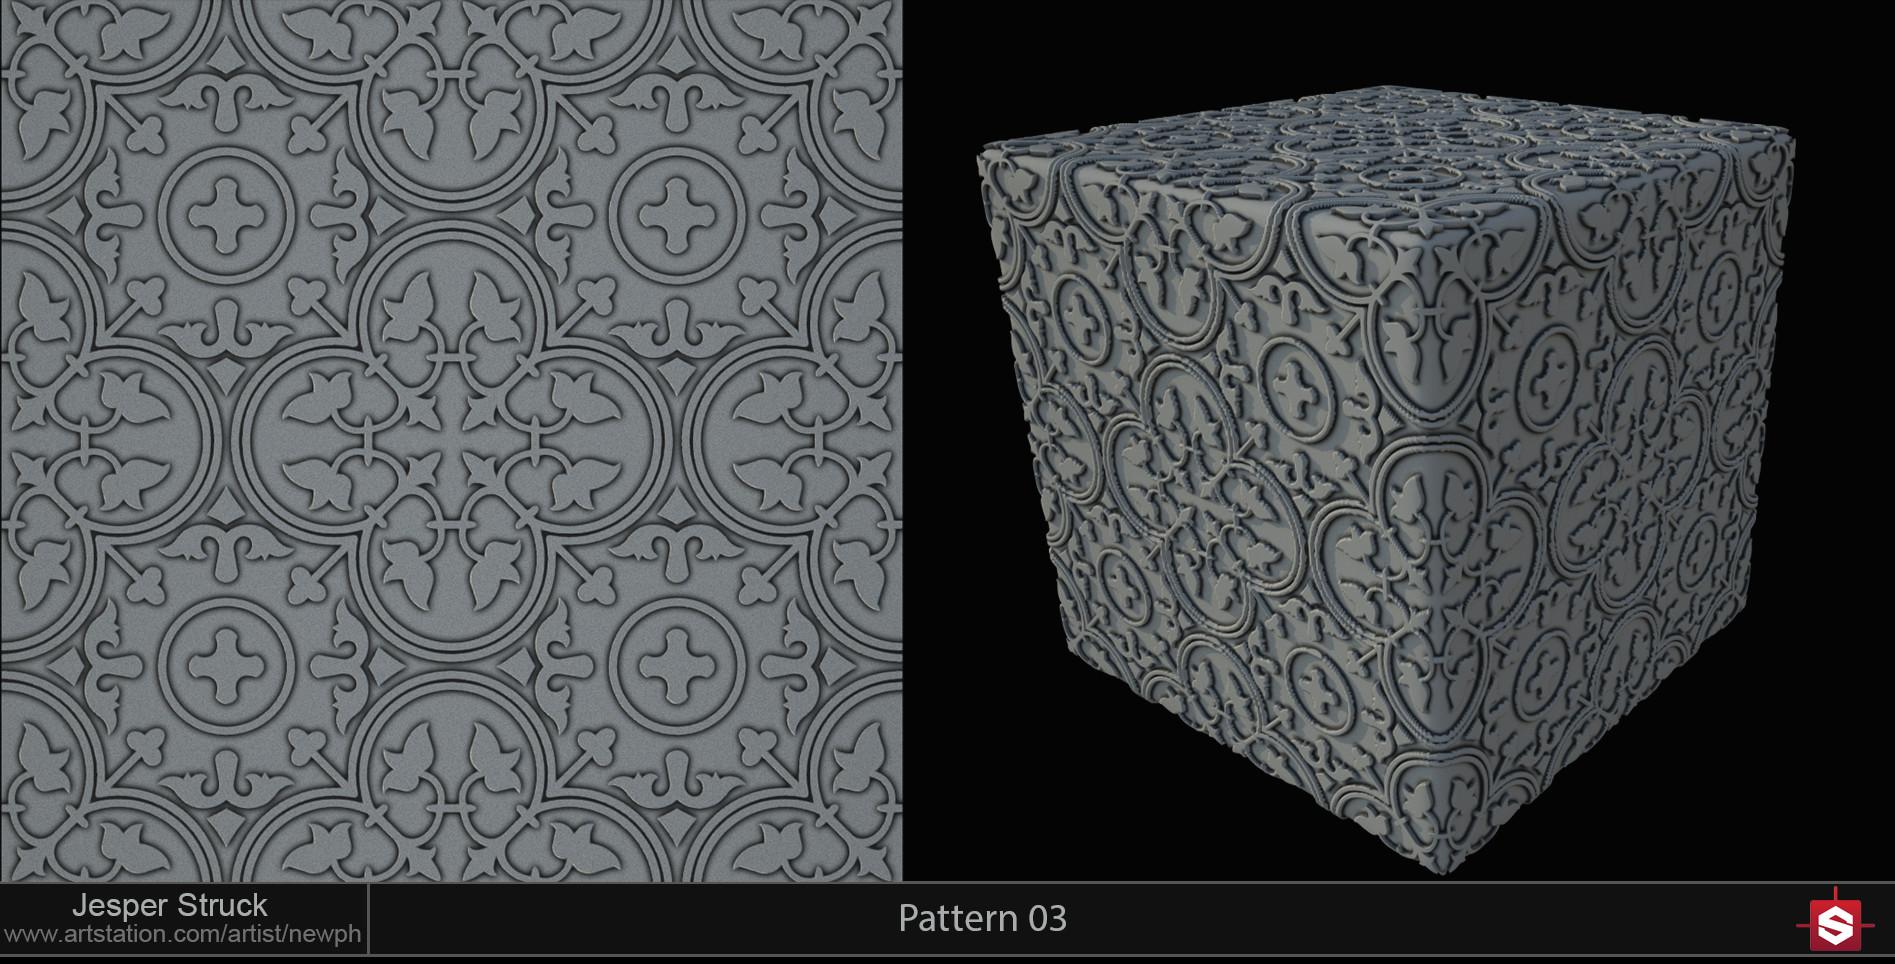 Jesper struck portfolio sd pattern 03